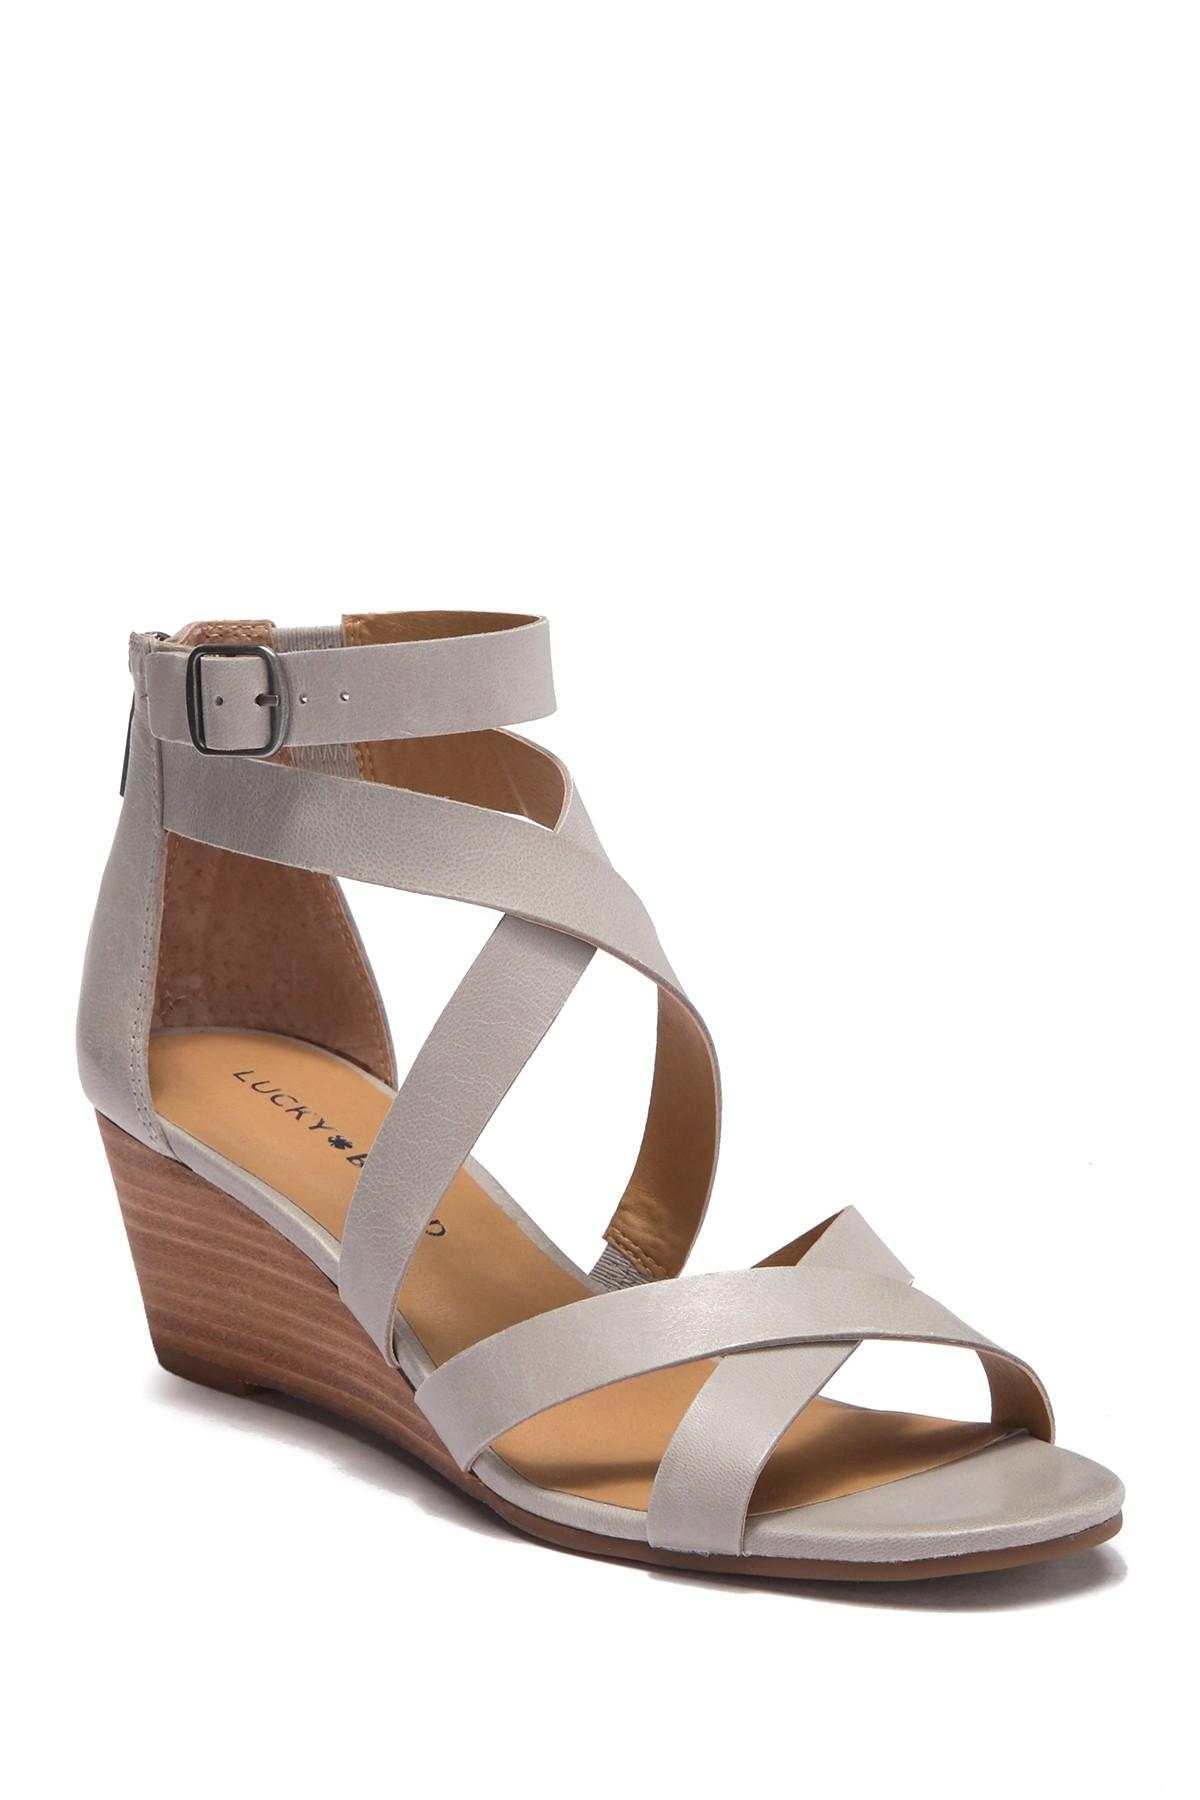 1a30a70df41 Lucky Brand - Gray Jinela Wedge Sandal - Lyst. View fullscreen